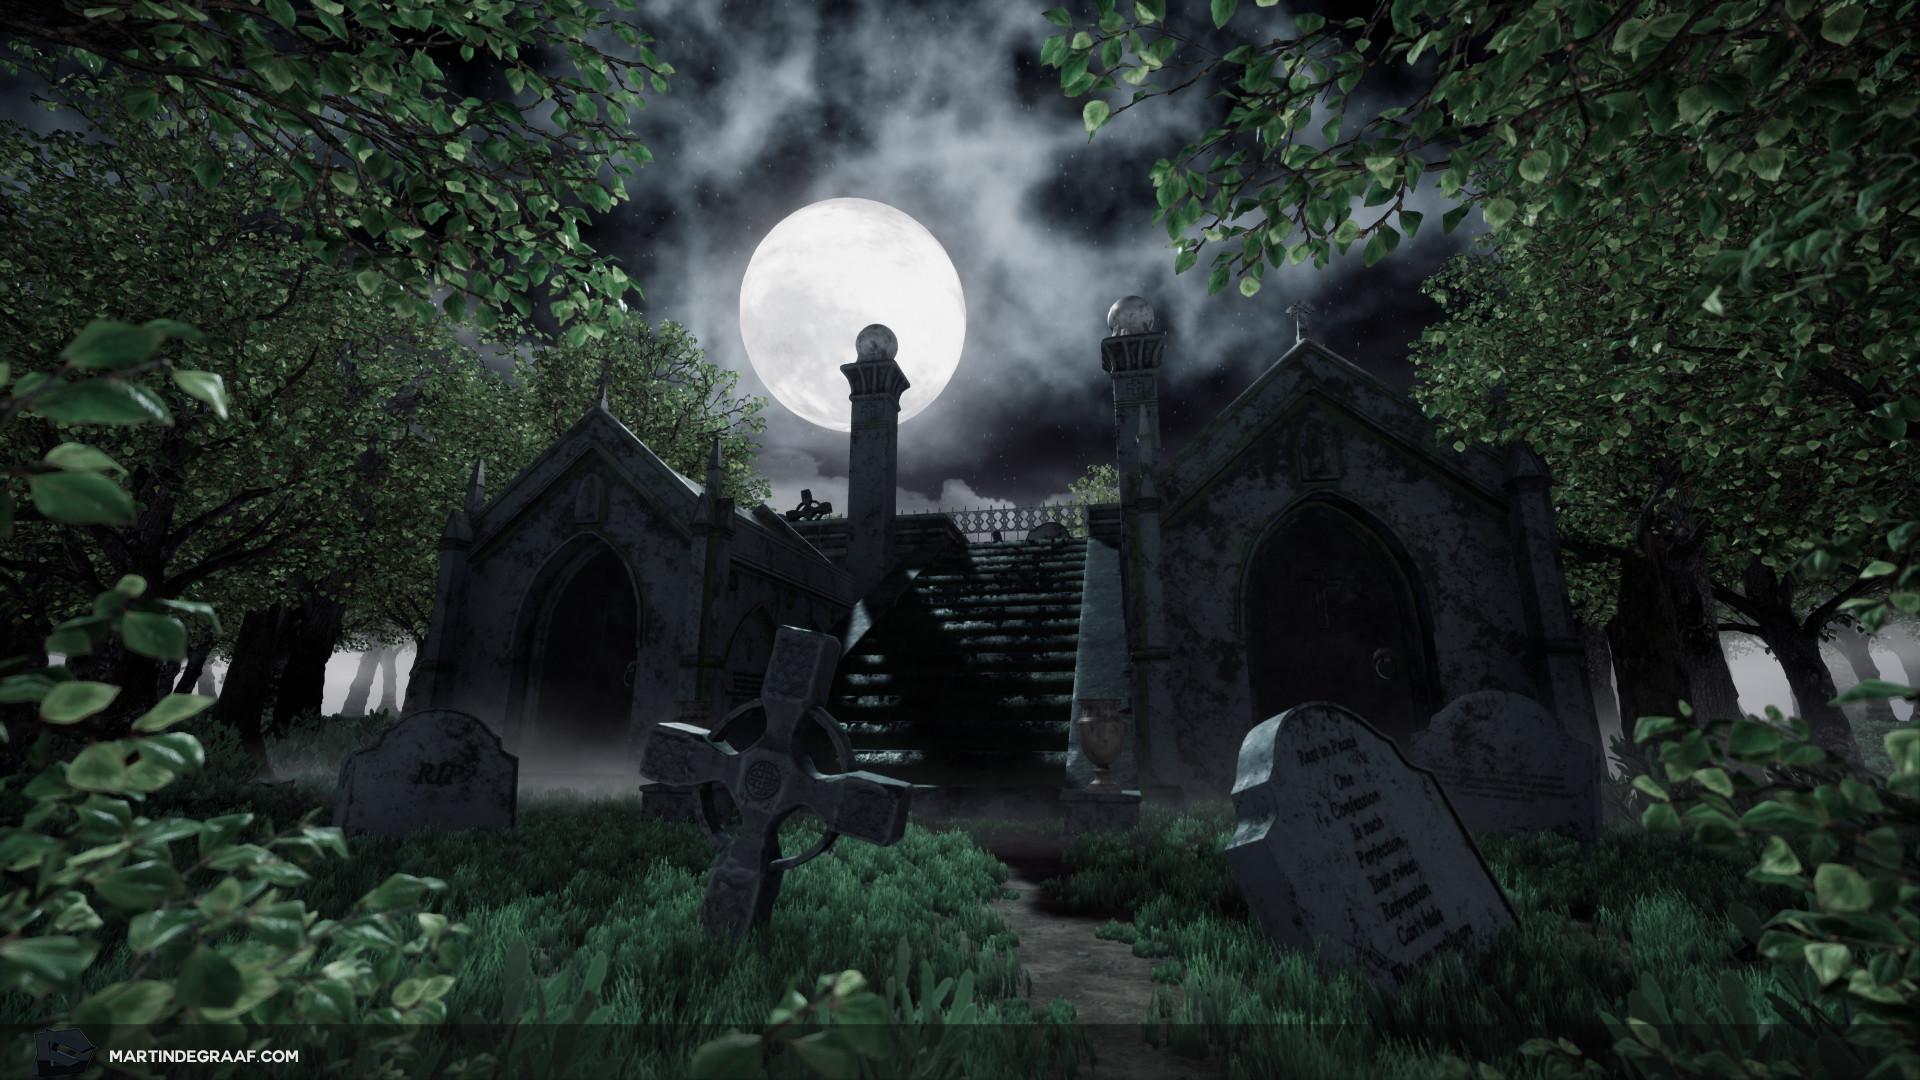 Martin de graaf the graveyard martin de graaf 2017